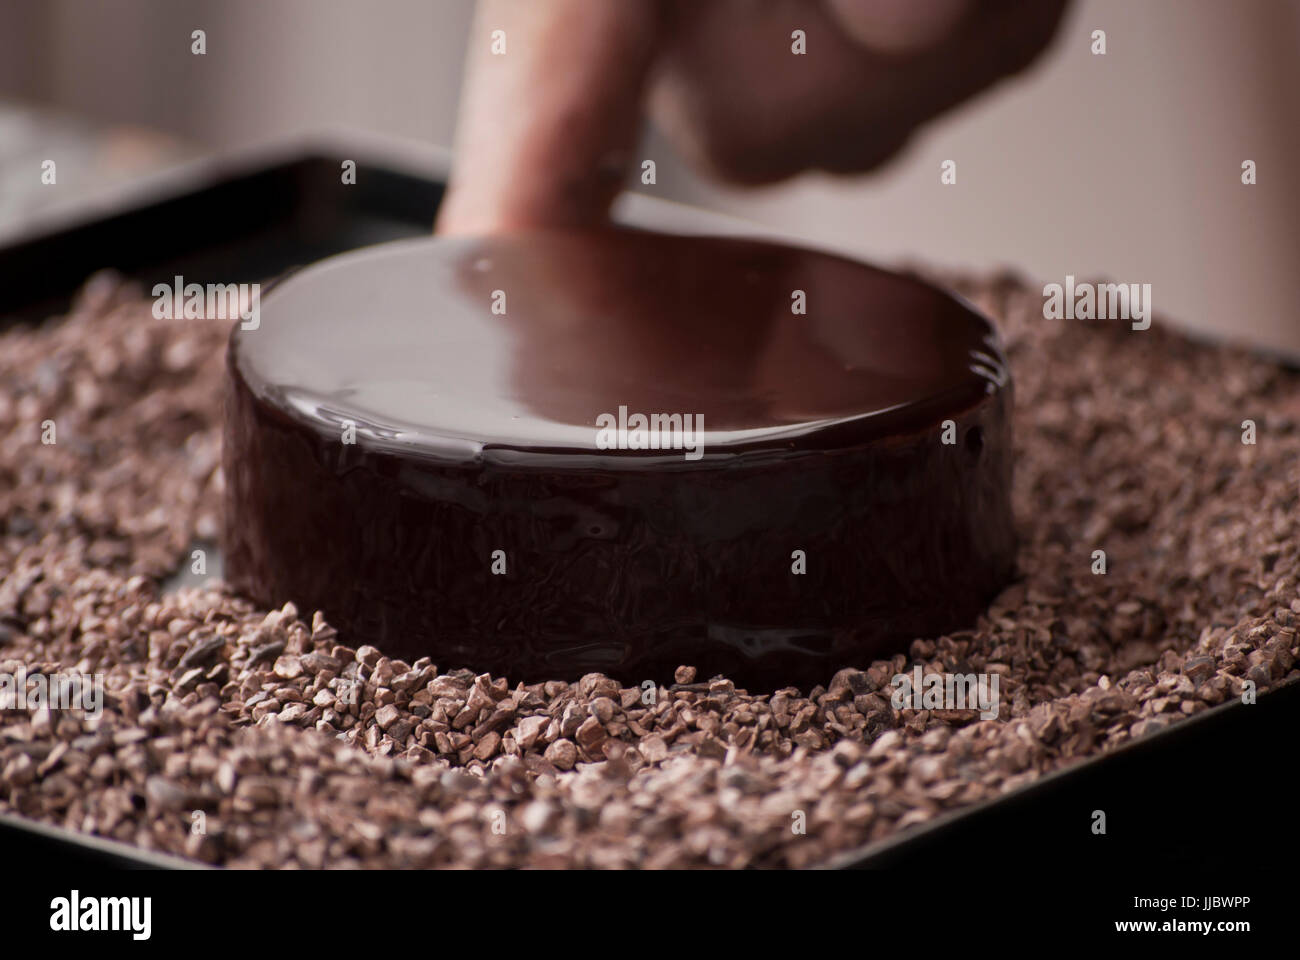 El Mousse de chocolate Imagen De Stock